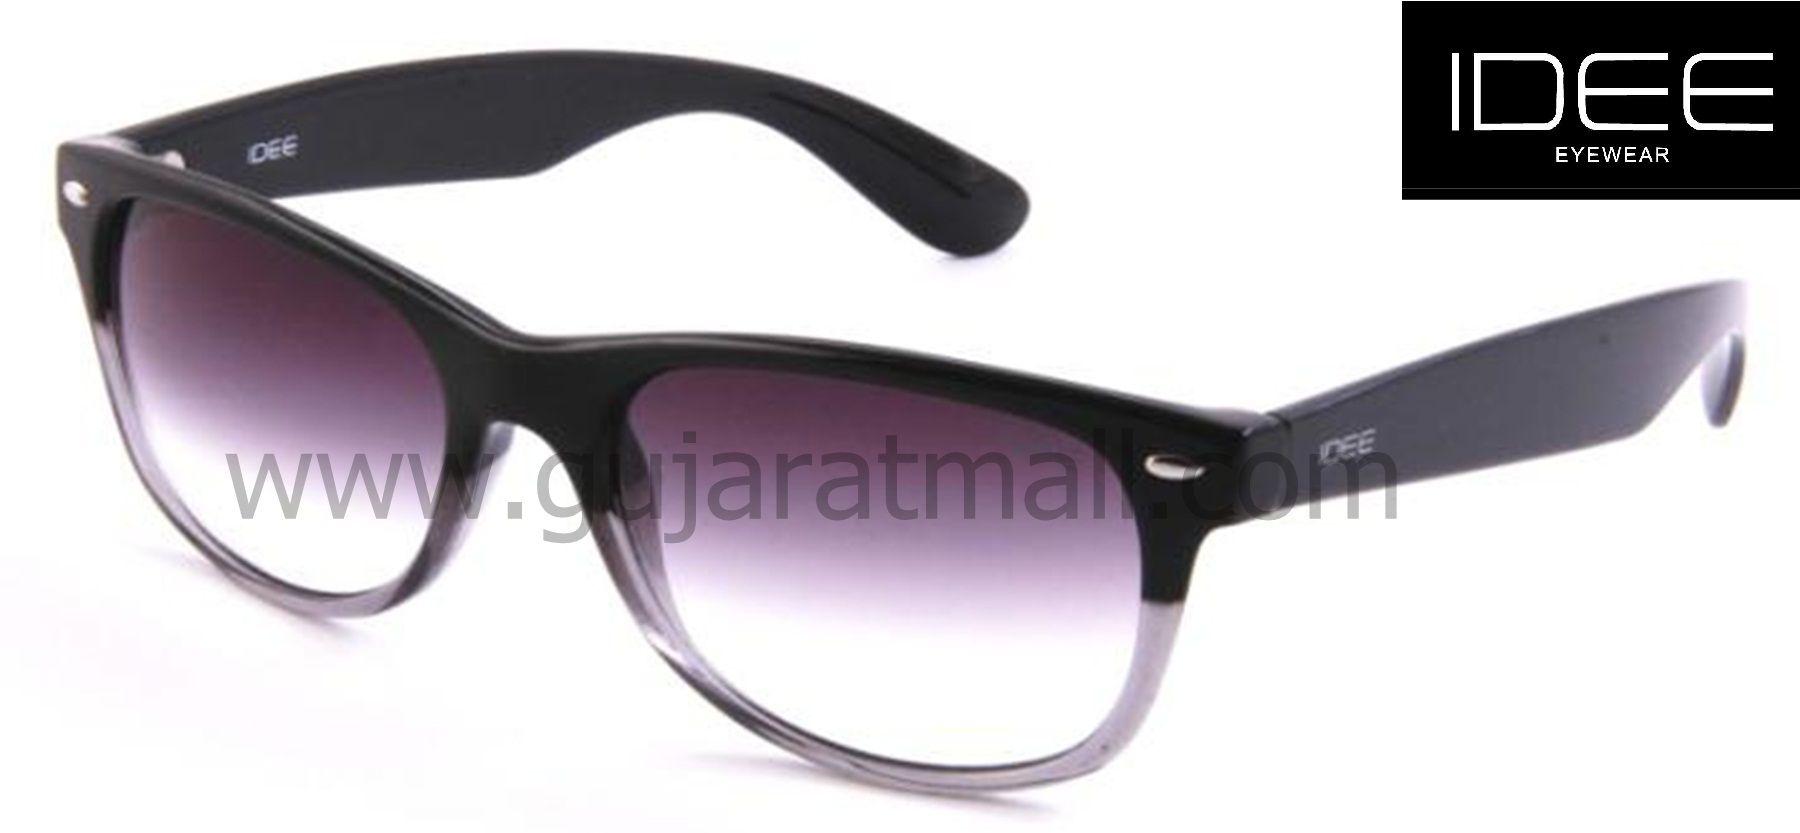 Buy Idee Sunglasses IDEE S1694 C3 Wayfarer • Gujaratmall